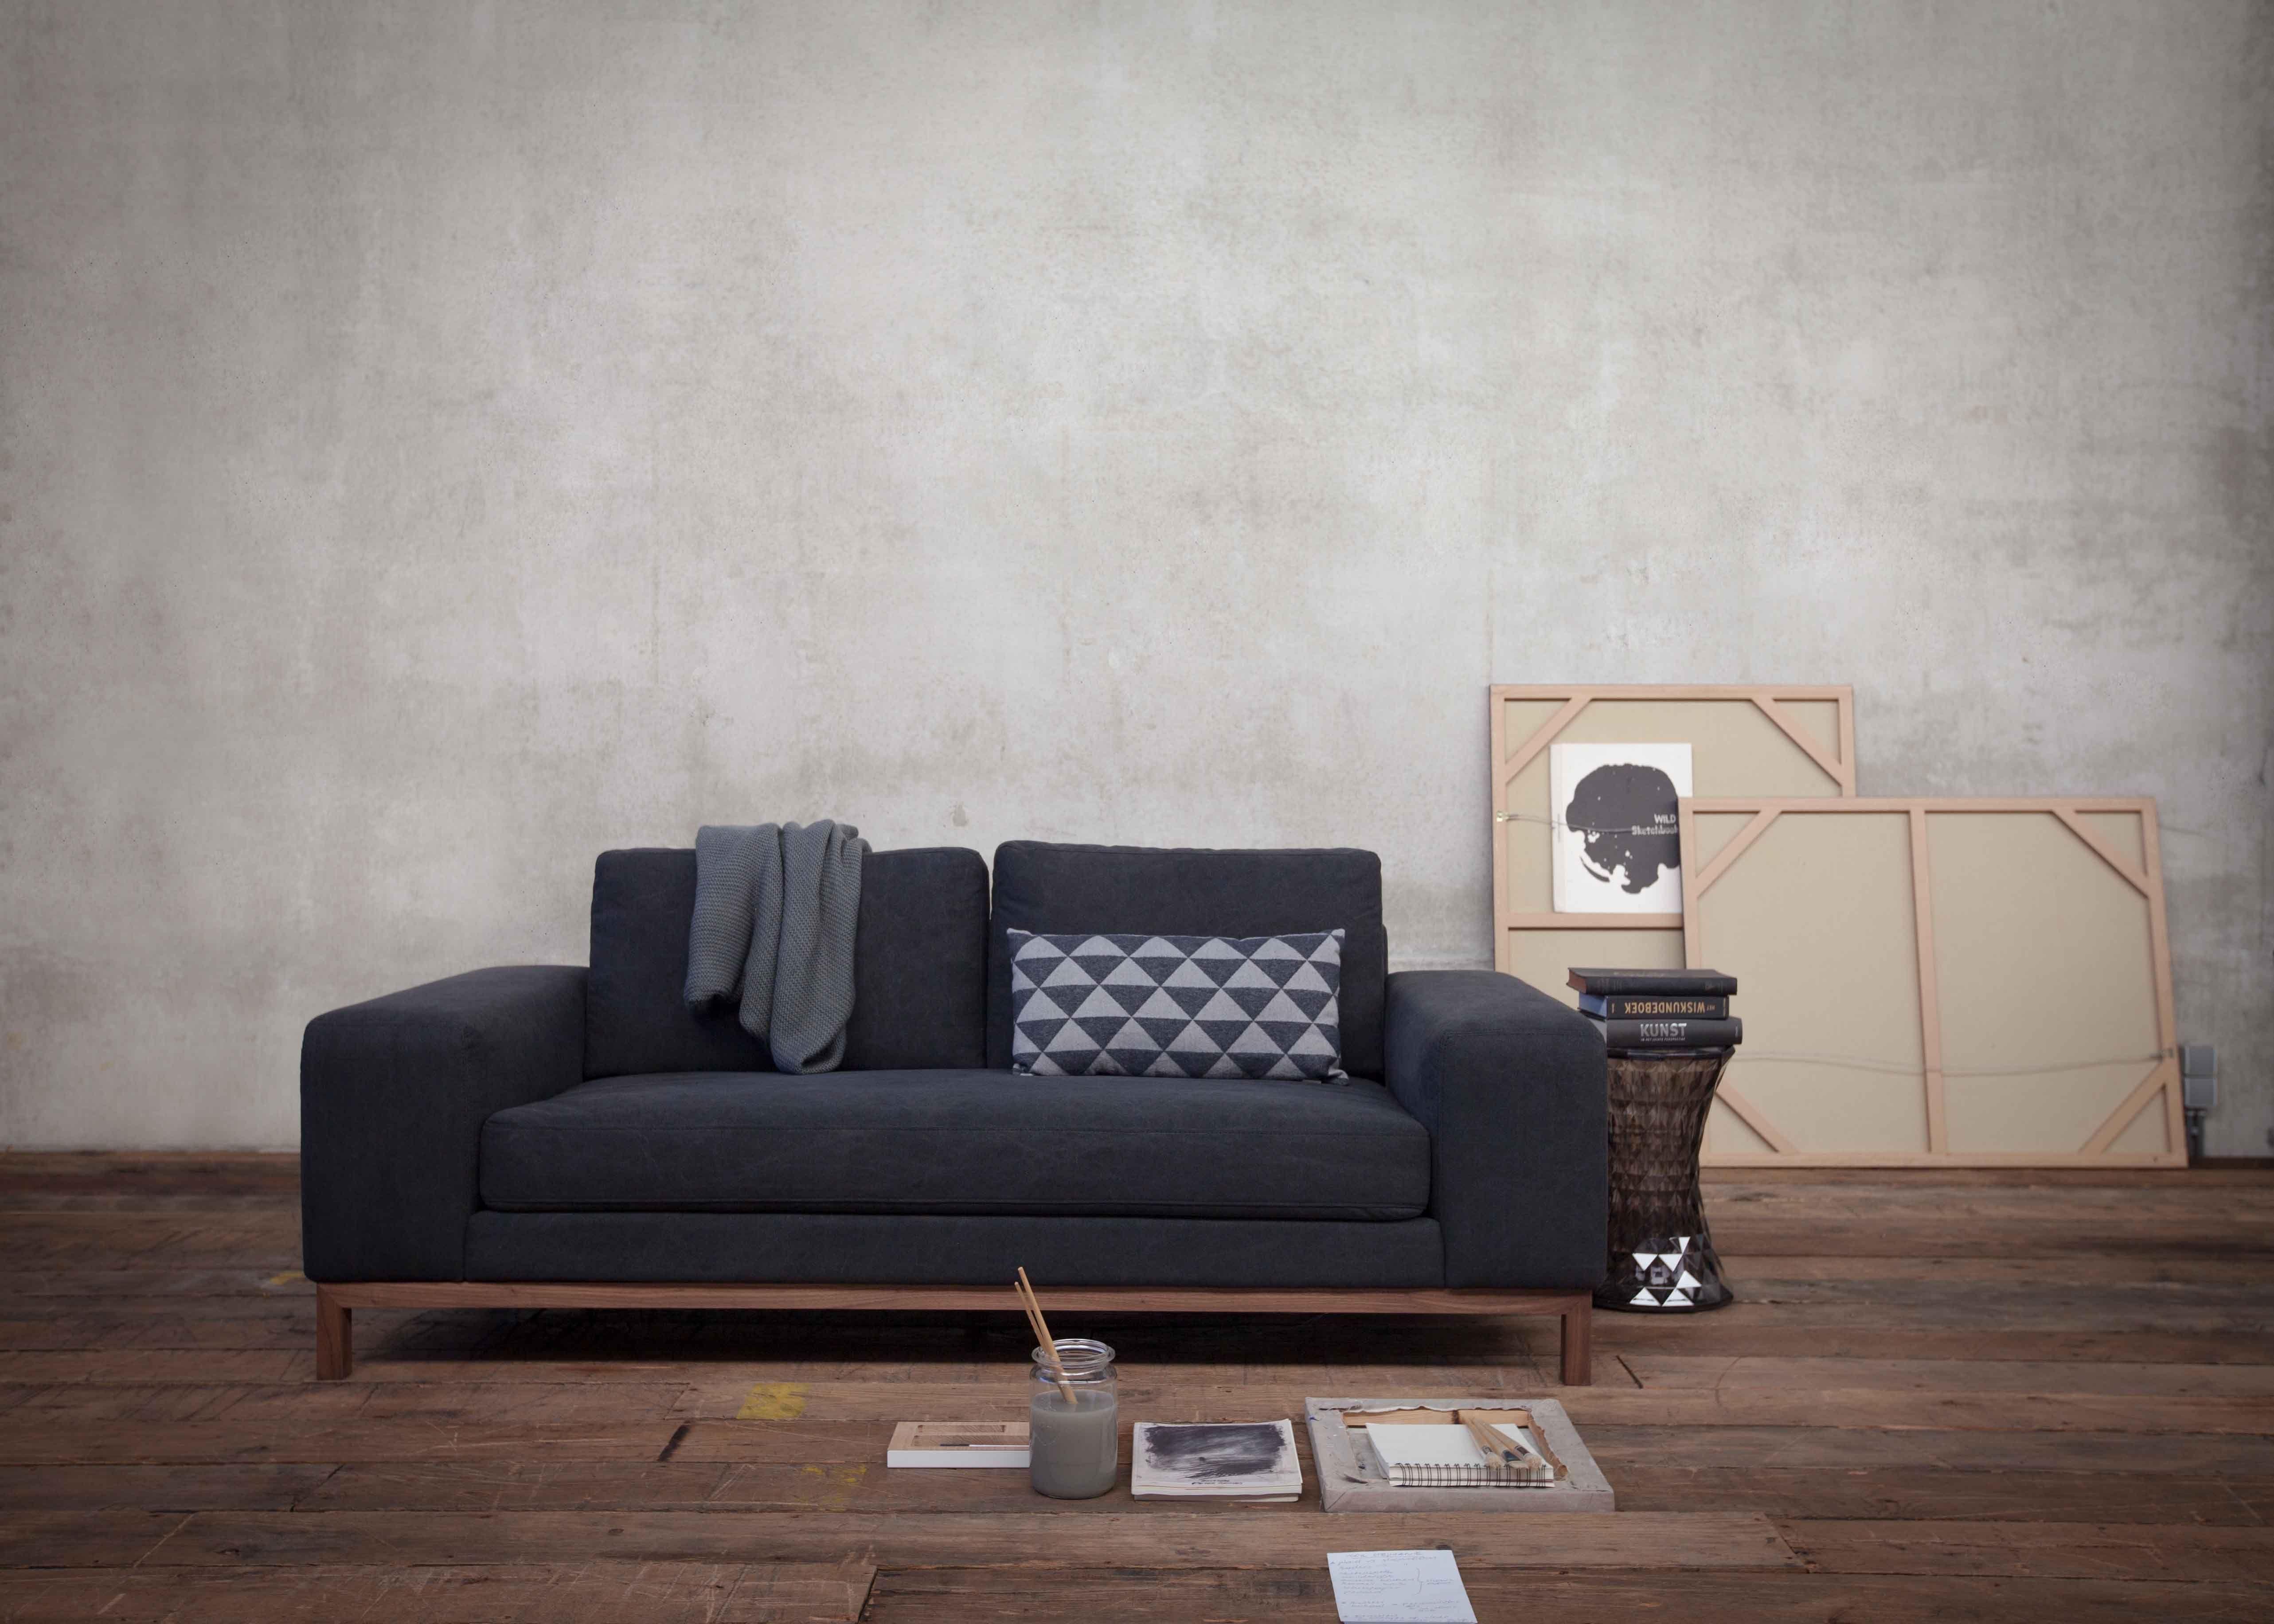 Modulares sofa mit auswechselbarem rcken mobeldesign - Modernes mobeldesign ...